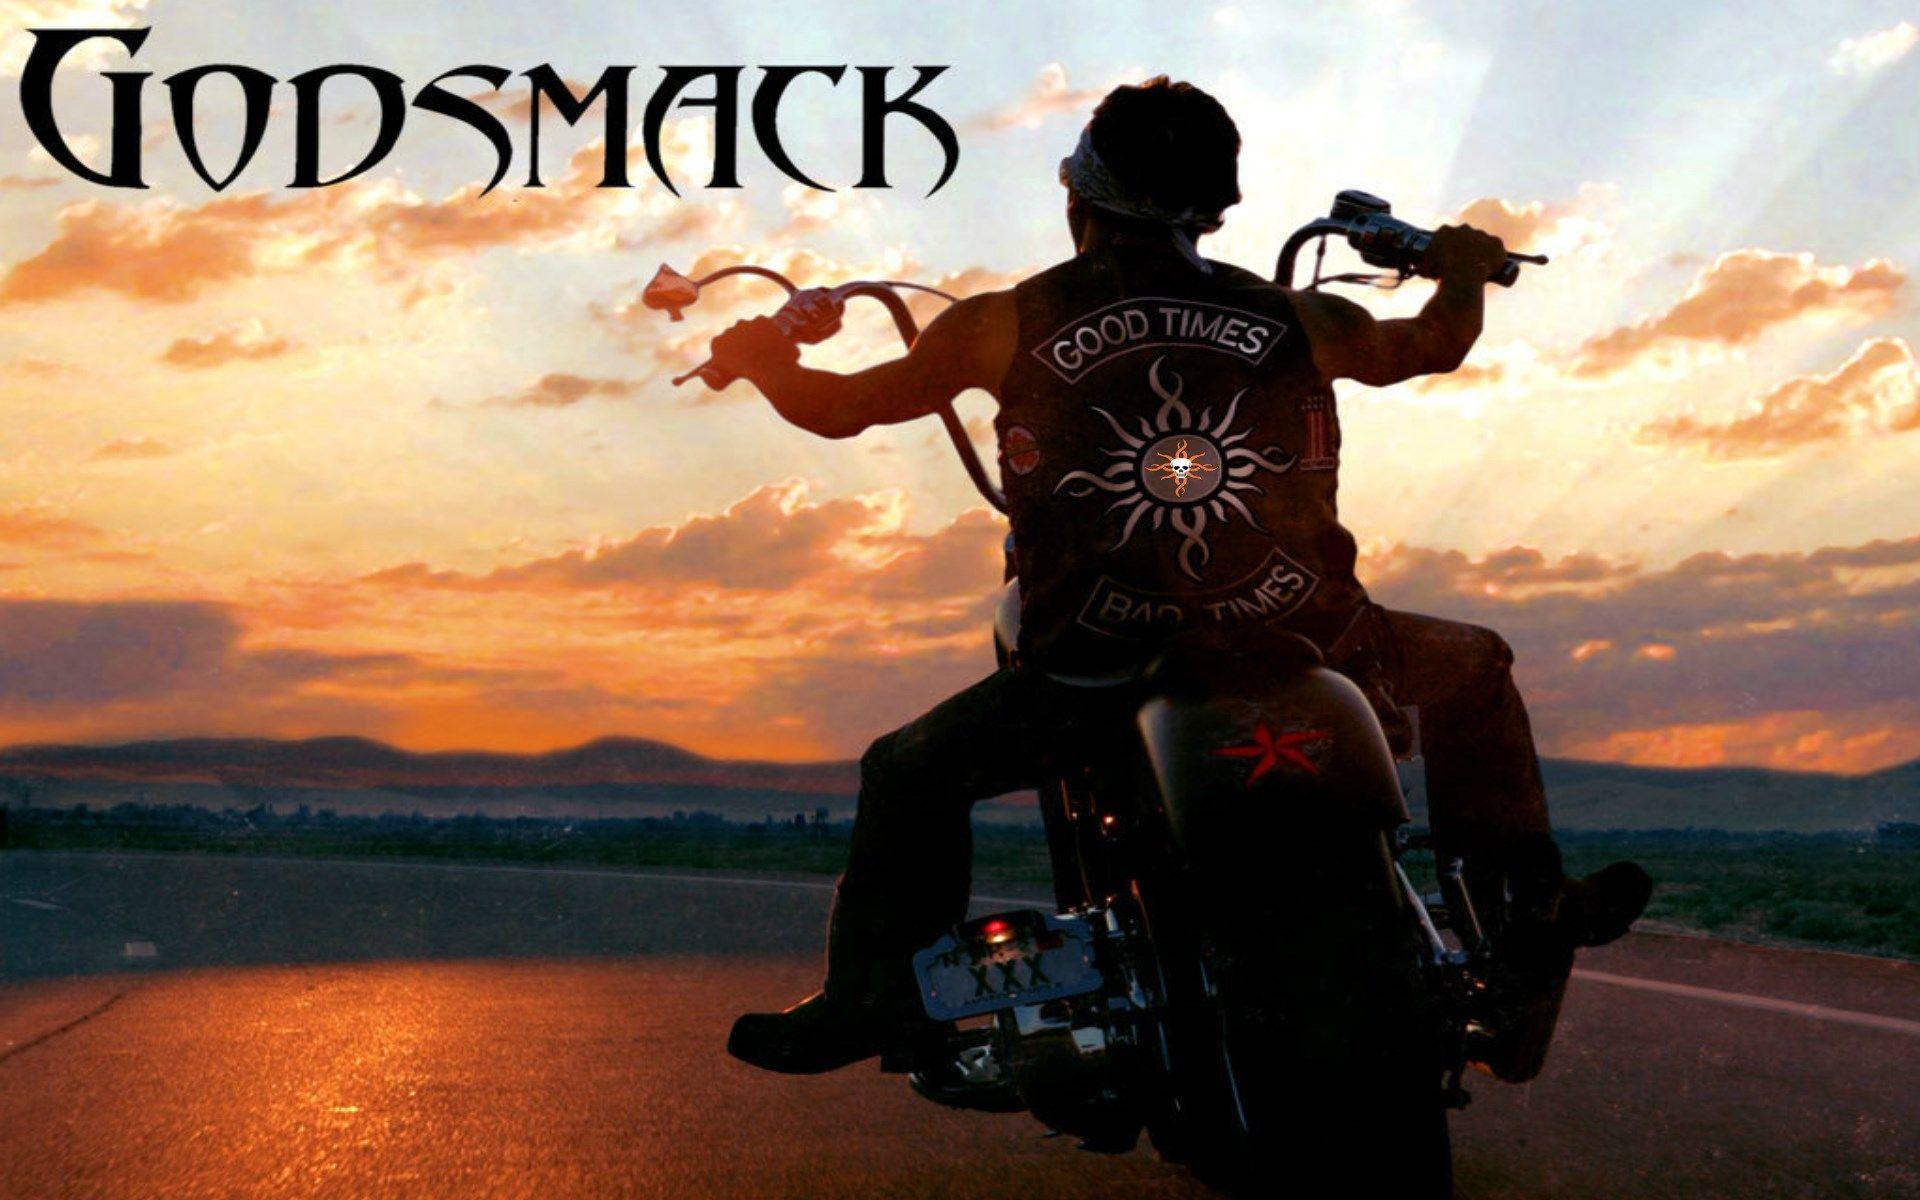 Godsmack Picture For Desktops Godsmack Category Sully Erna Sully Christian Rock Bands